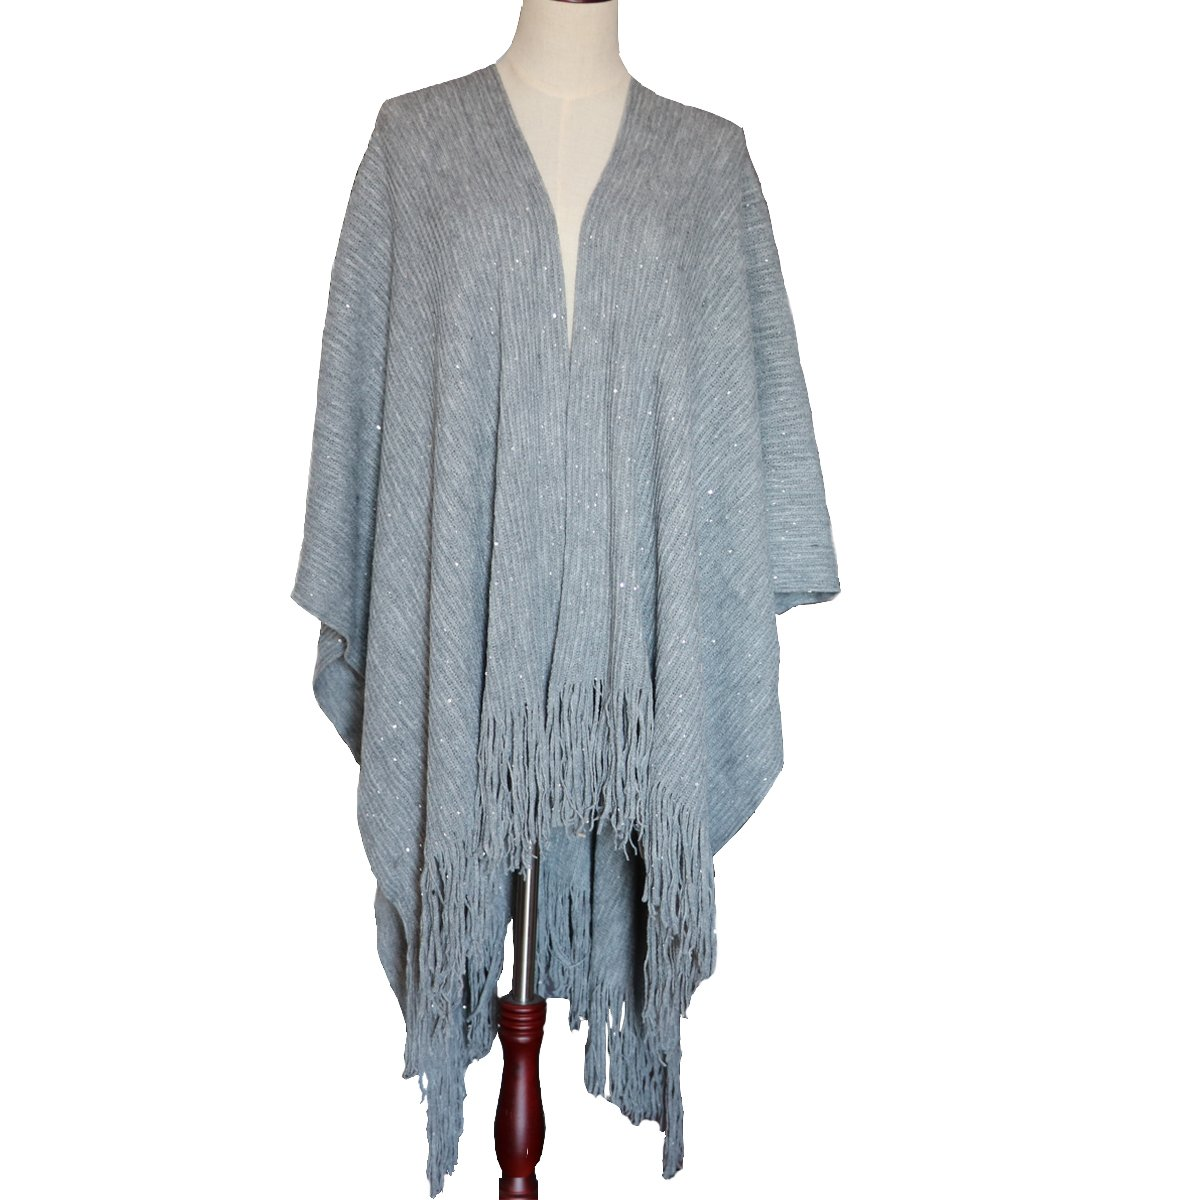 ZISUEX ACCESSORY レディース B07768NQHG Gray-sequin Gray-sequin